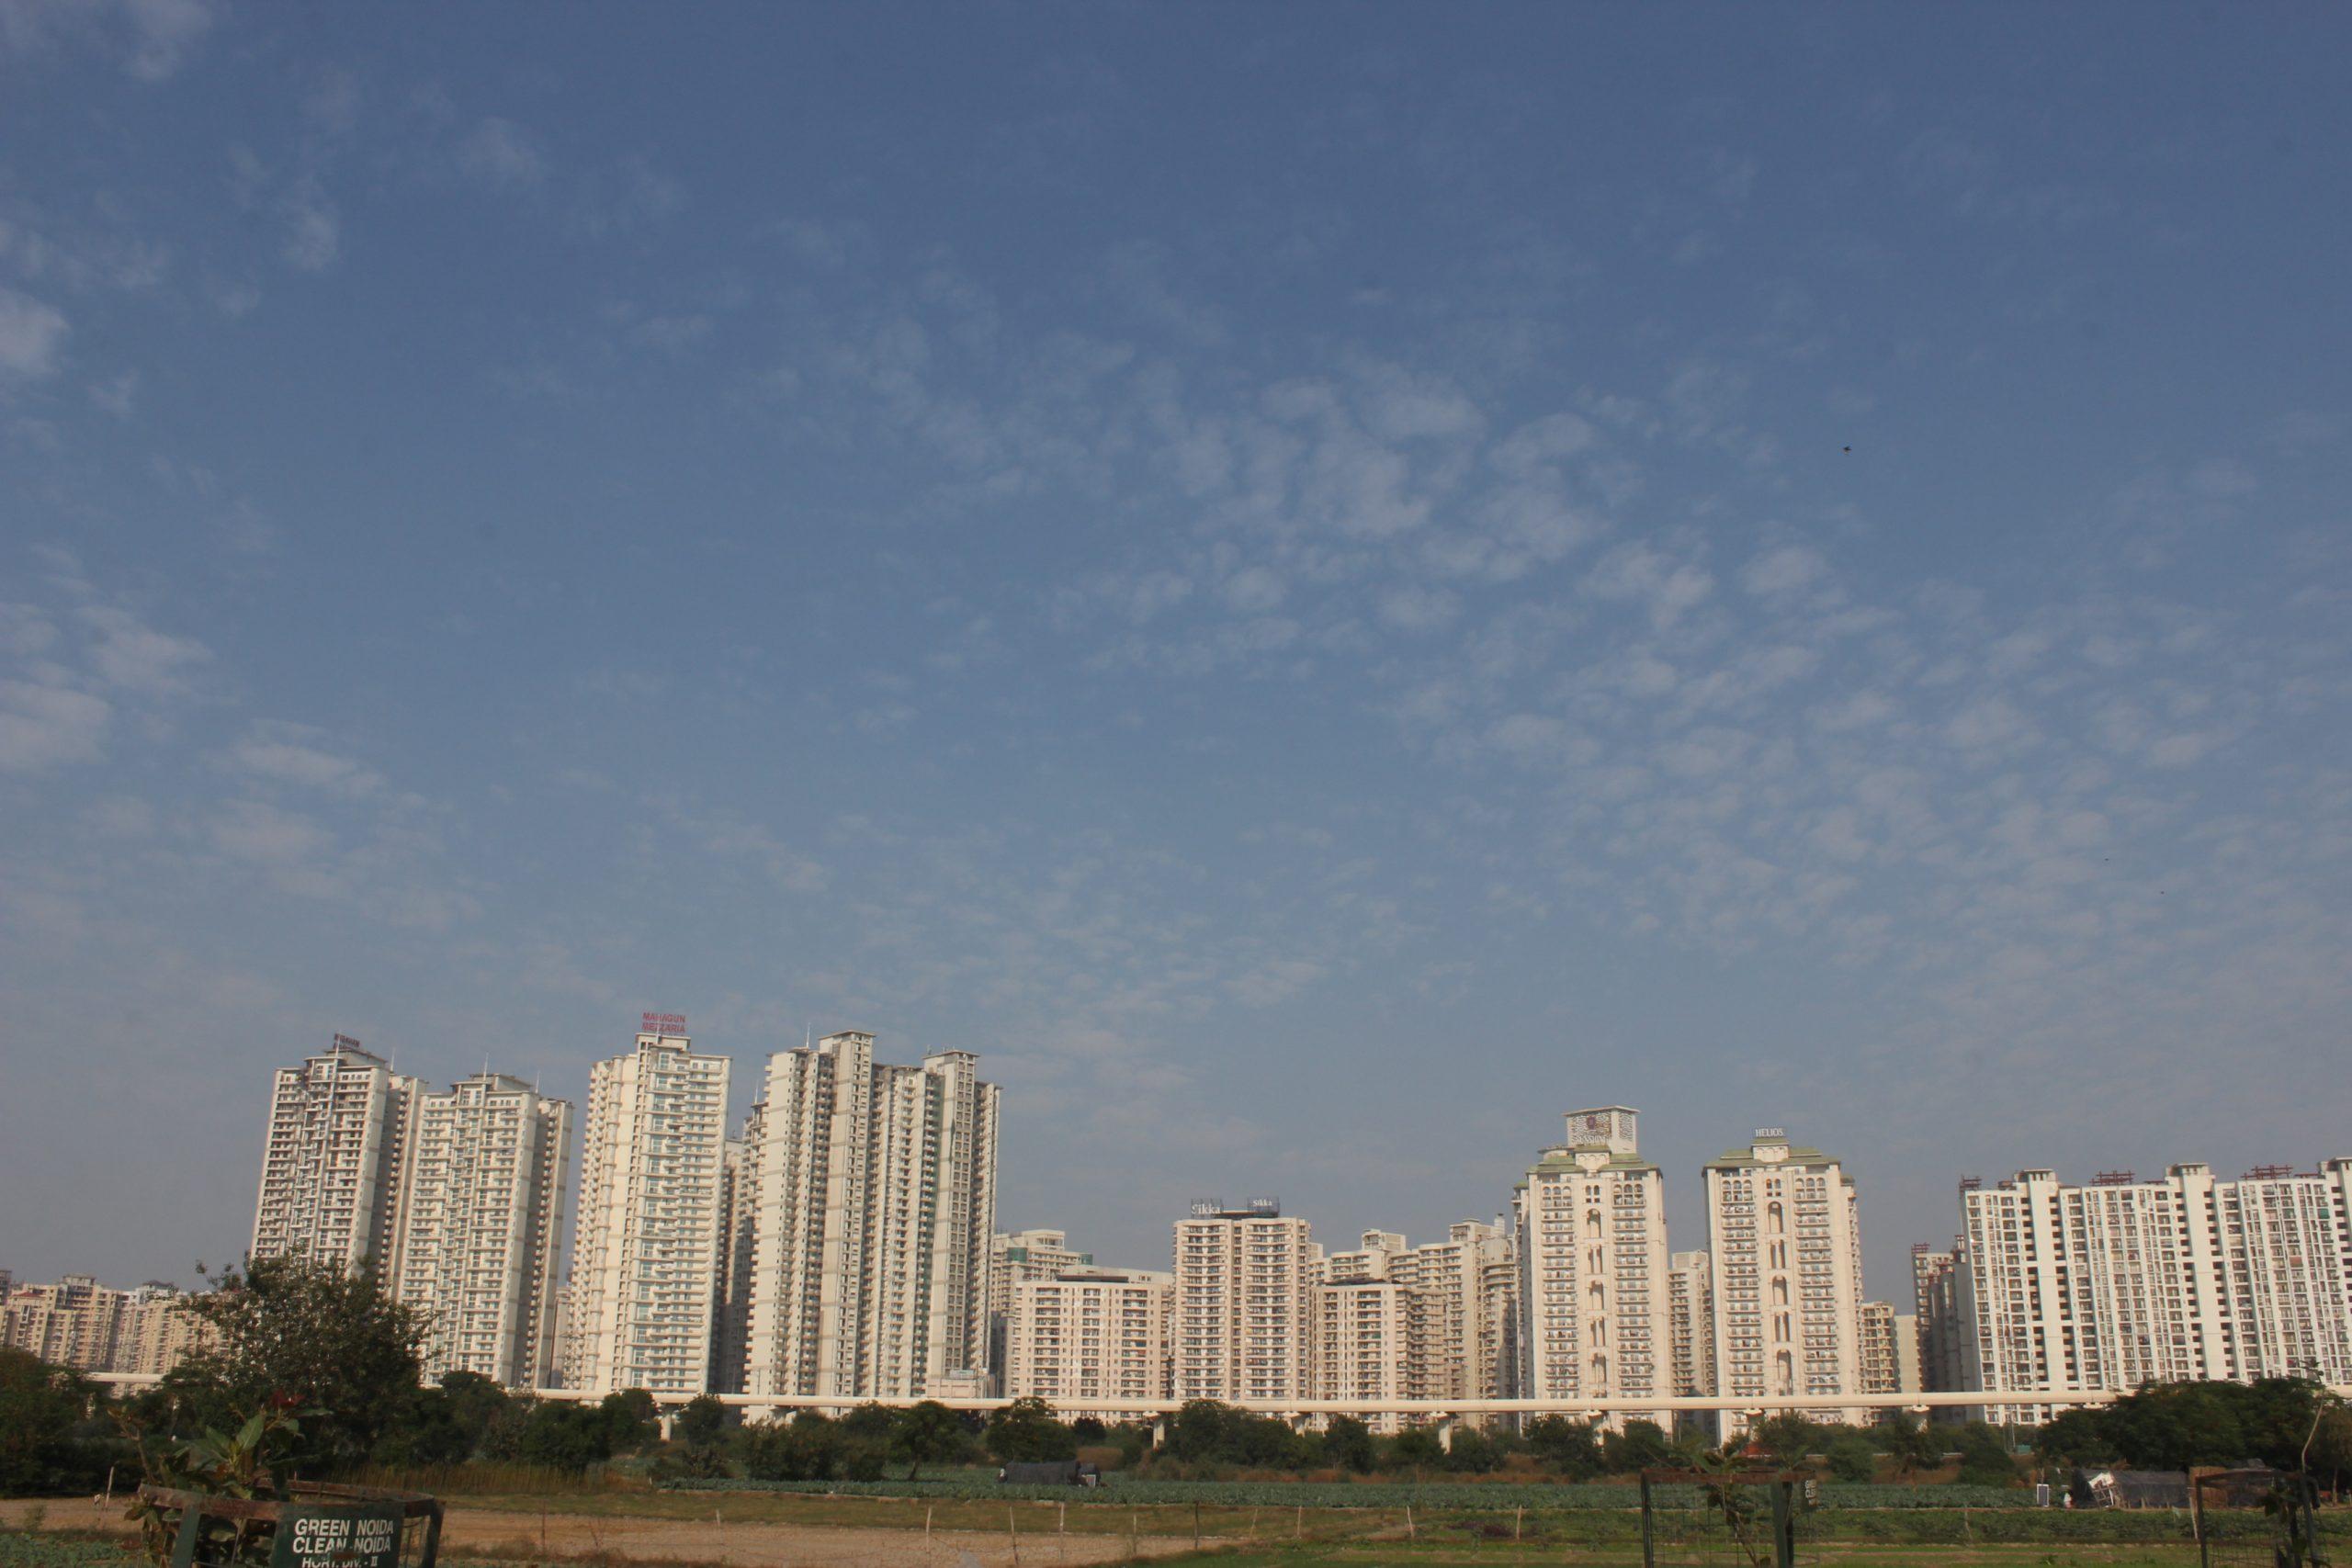 Tall buildings of Noida city